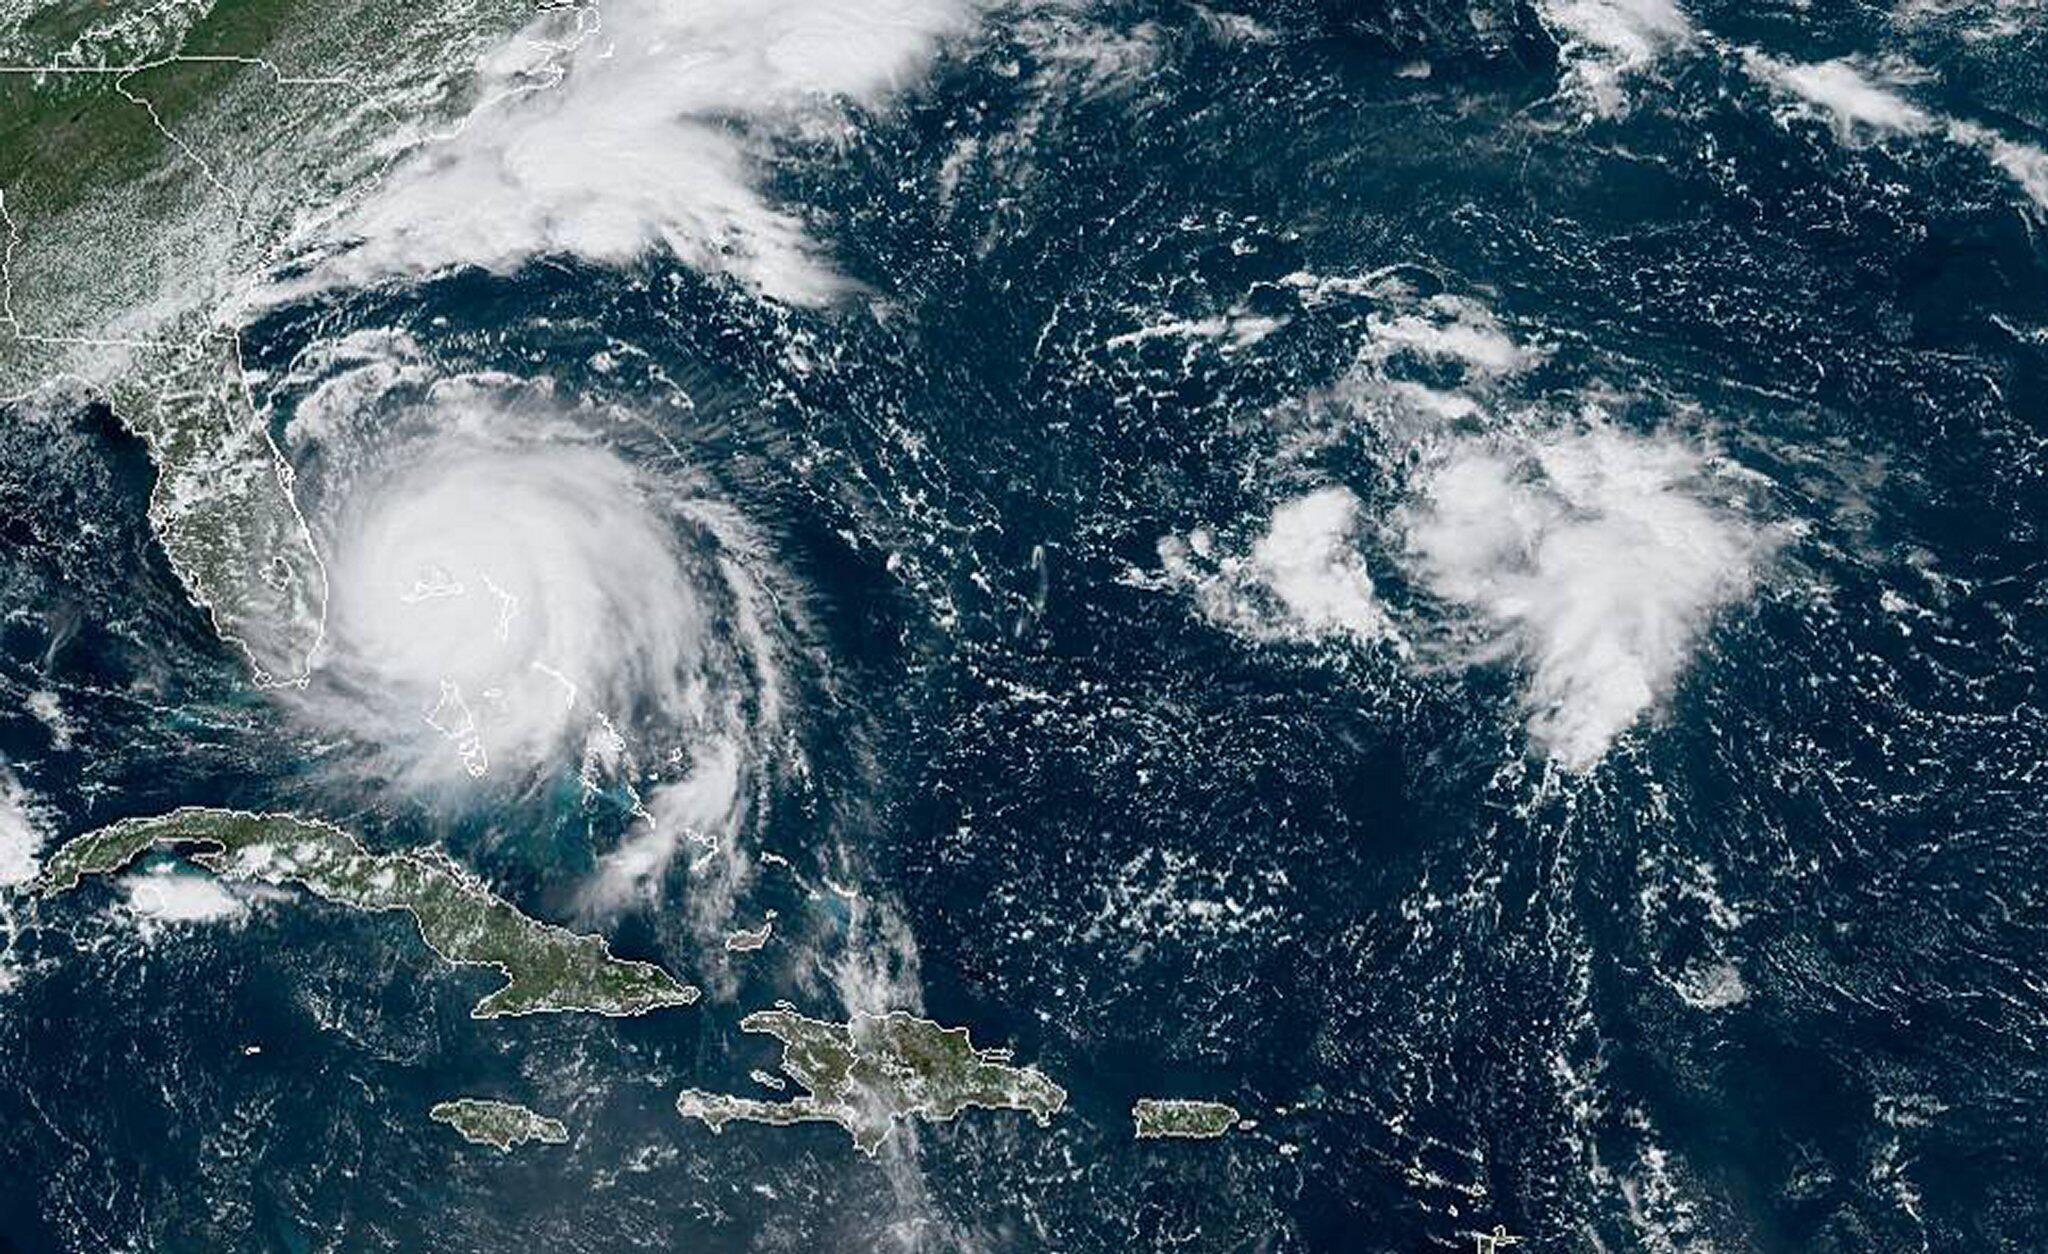 Bild zu Hurrikan, Dorian, Bahamas, Satellitenbild, National Oceanic and Atmospheric Administration